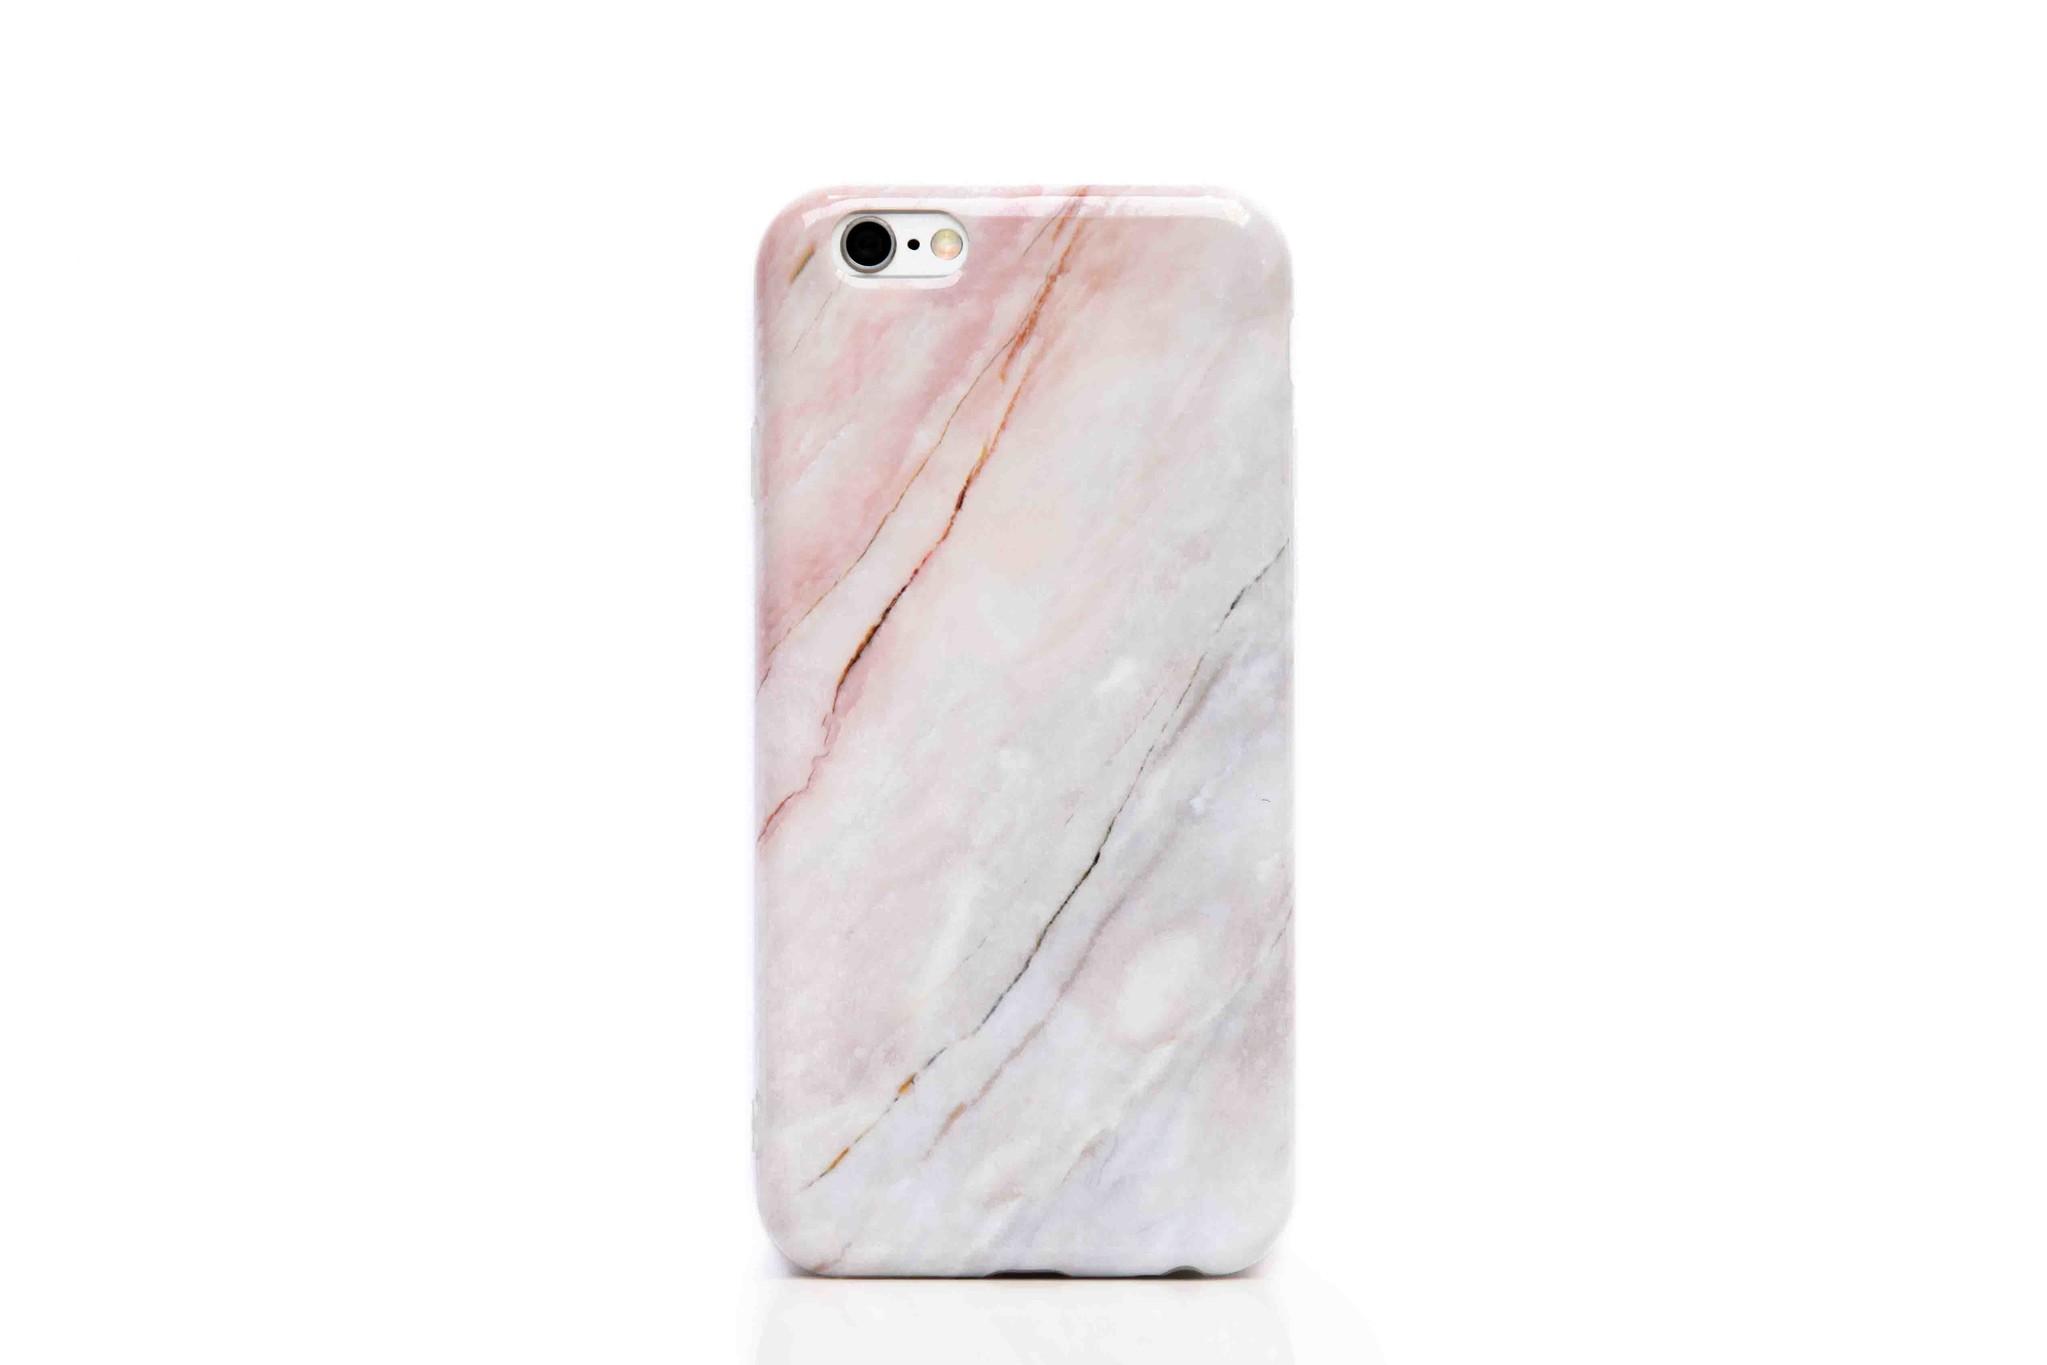 Smartphonehoesje iPhone 6 plus   Marmerlook   Wit / roze